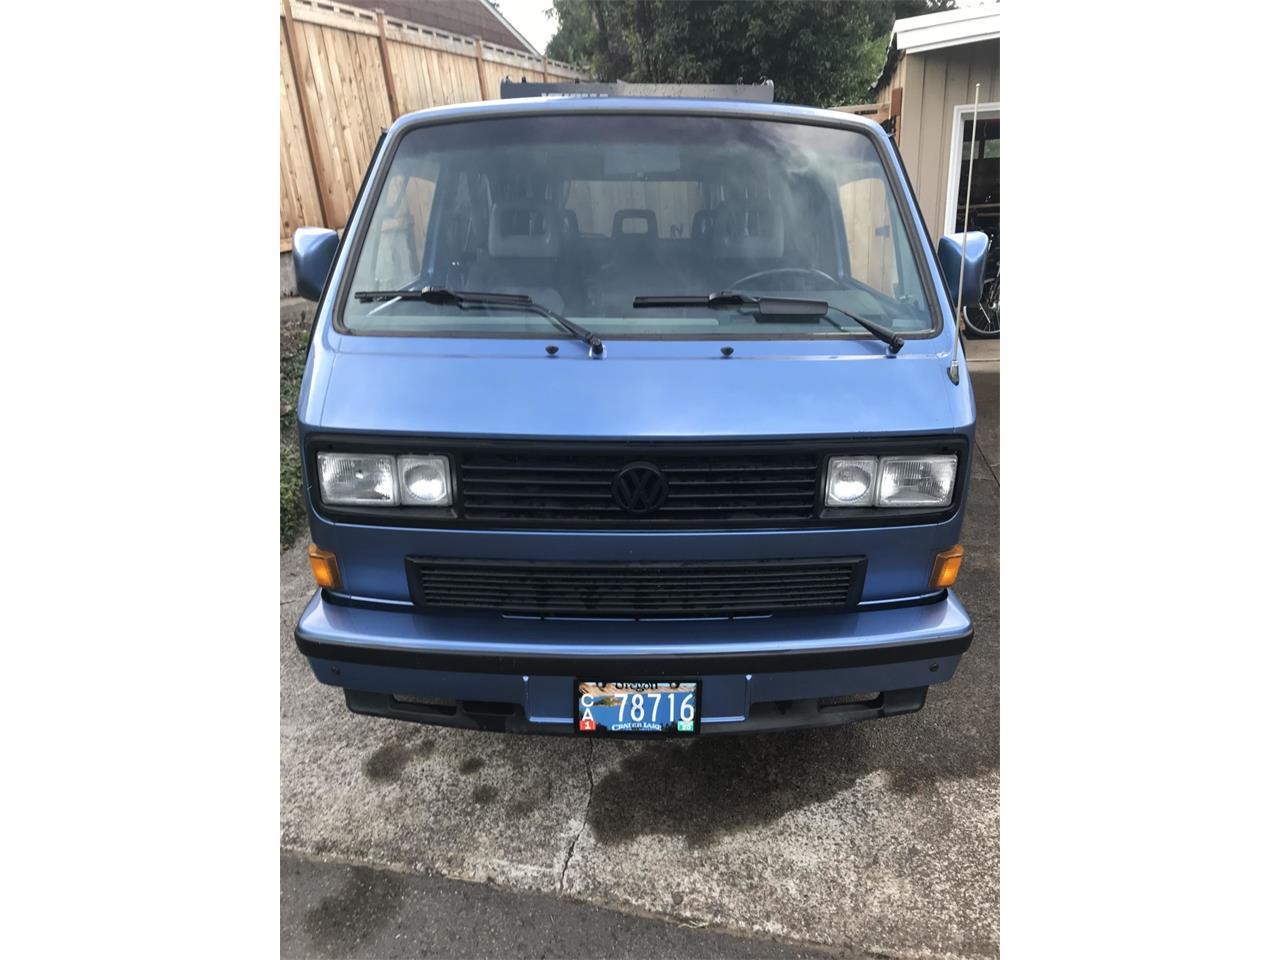 1989 Volkswagen Vanagon For Sale Classiccars Com Cc 1262837